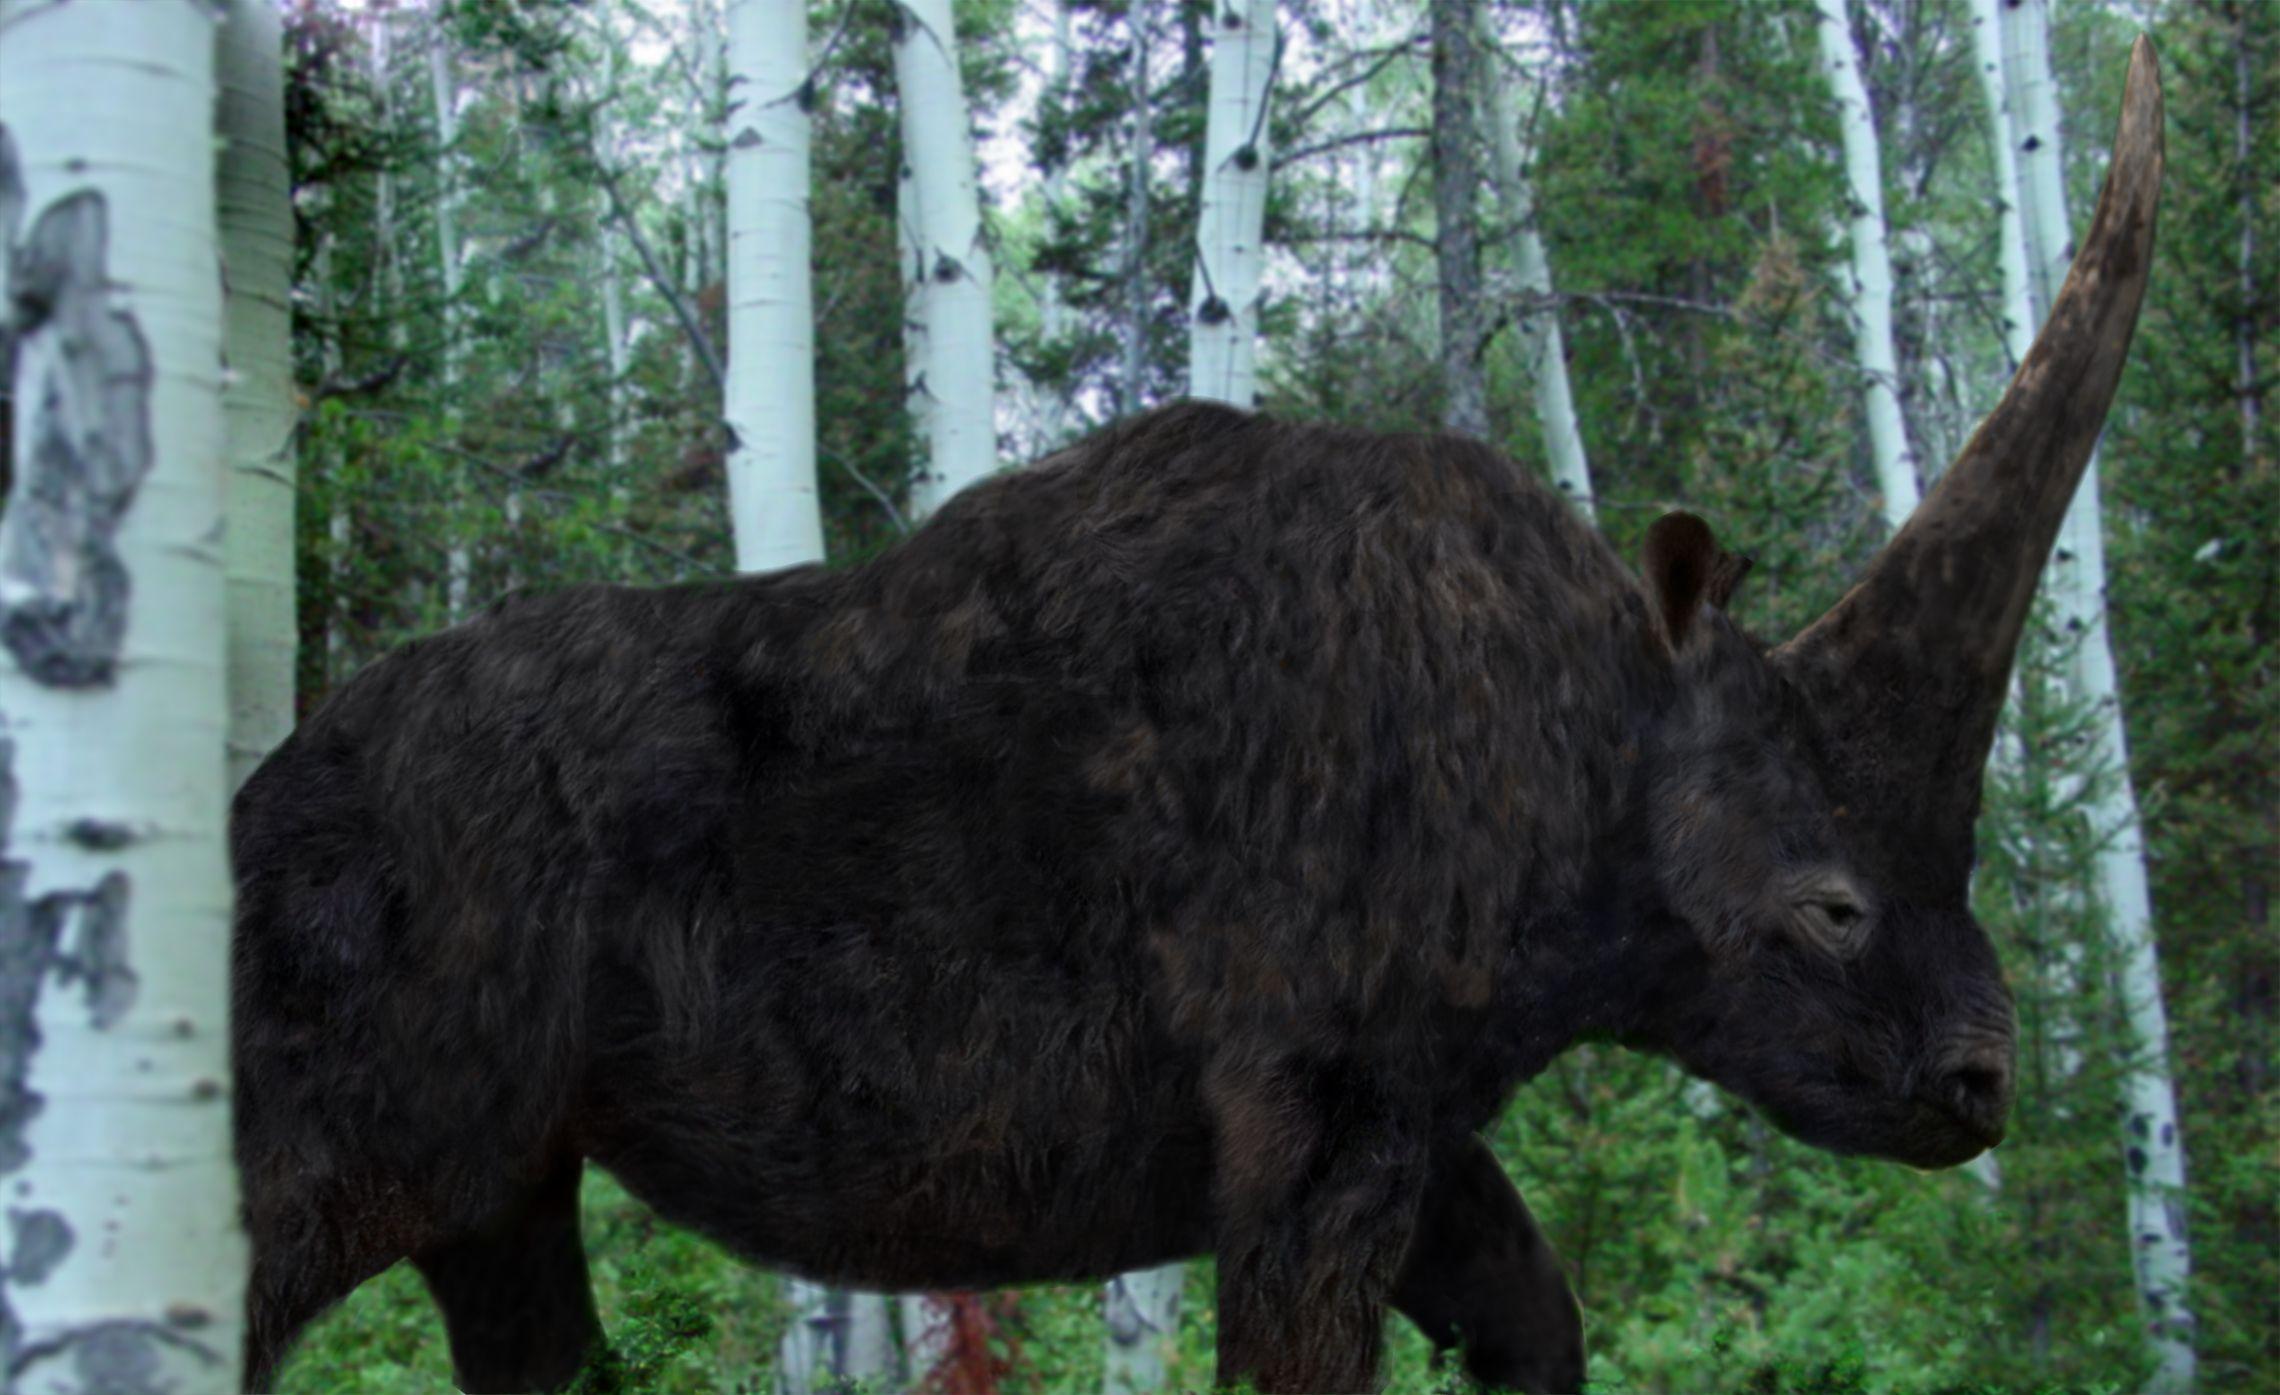 Recreation of the Elasmotherium, went extinct 50,000 years